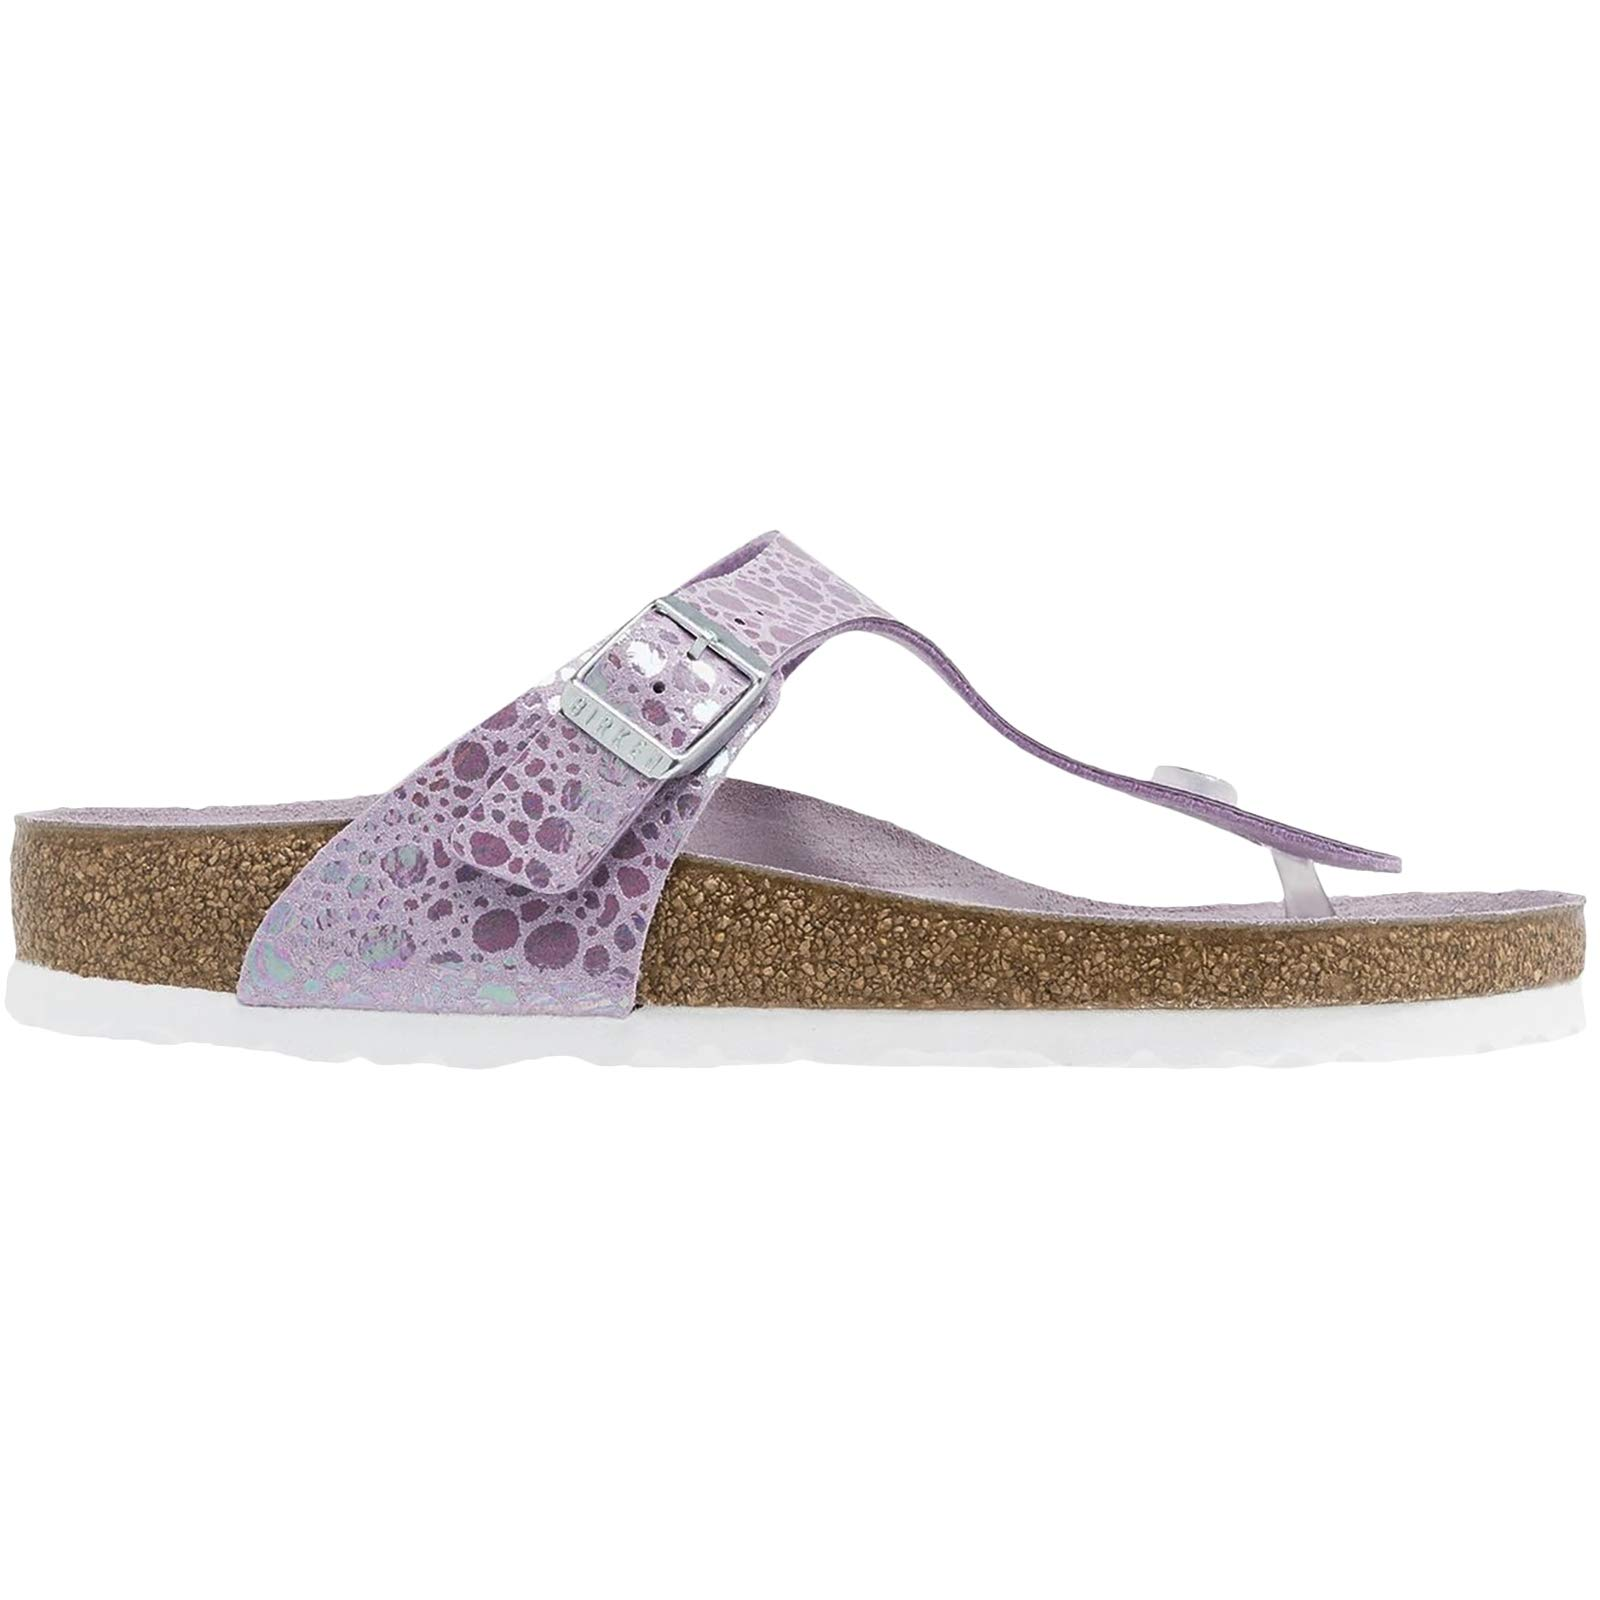 9e80279dac8c Galleon - Birkenstock Unisex Gizeh Birko-Flor Lilac Sandals 7 W   5 M US